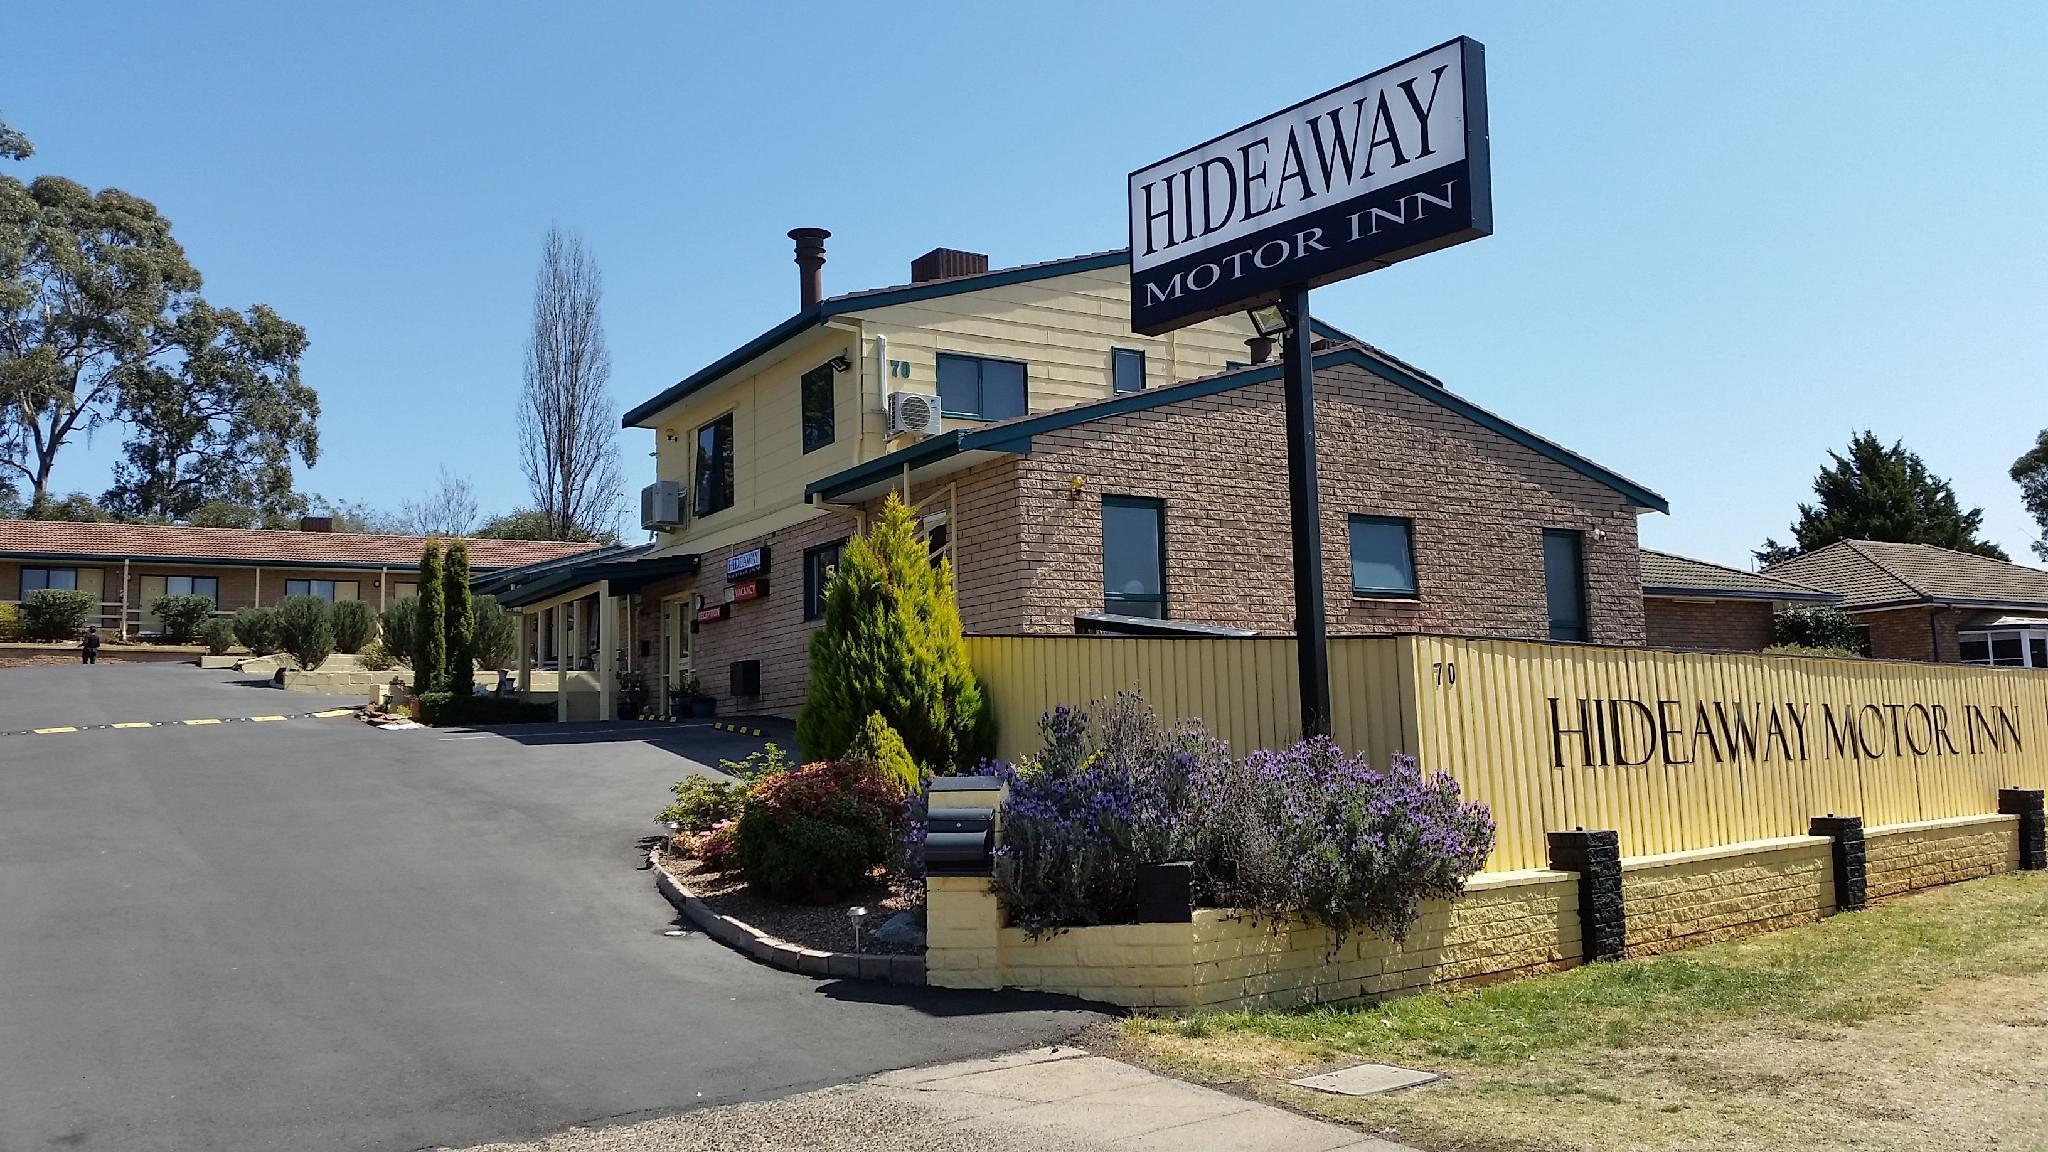 Hideaway Motor Inn